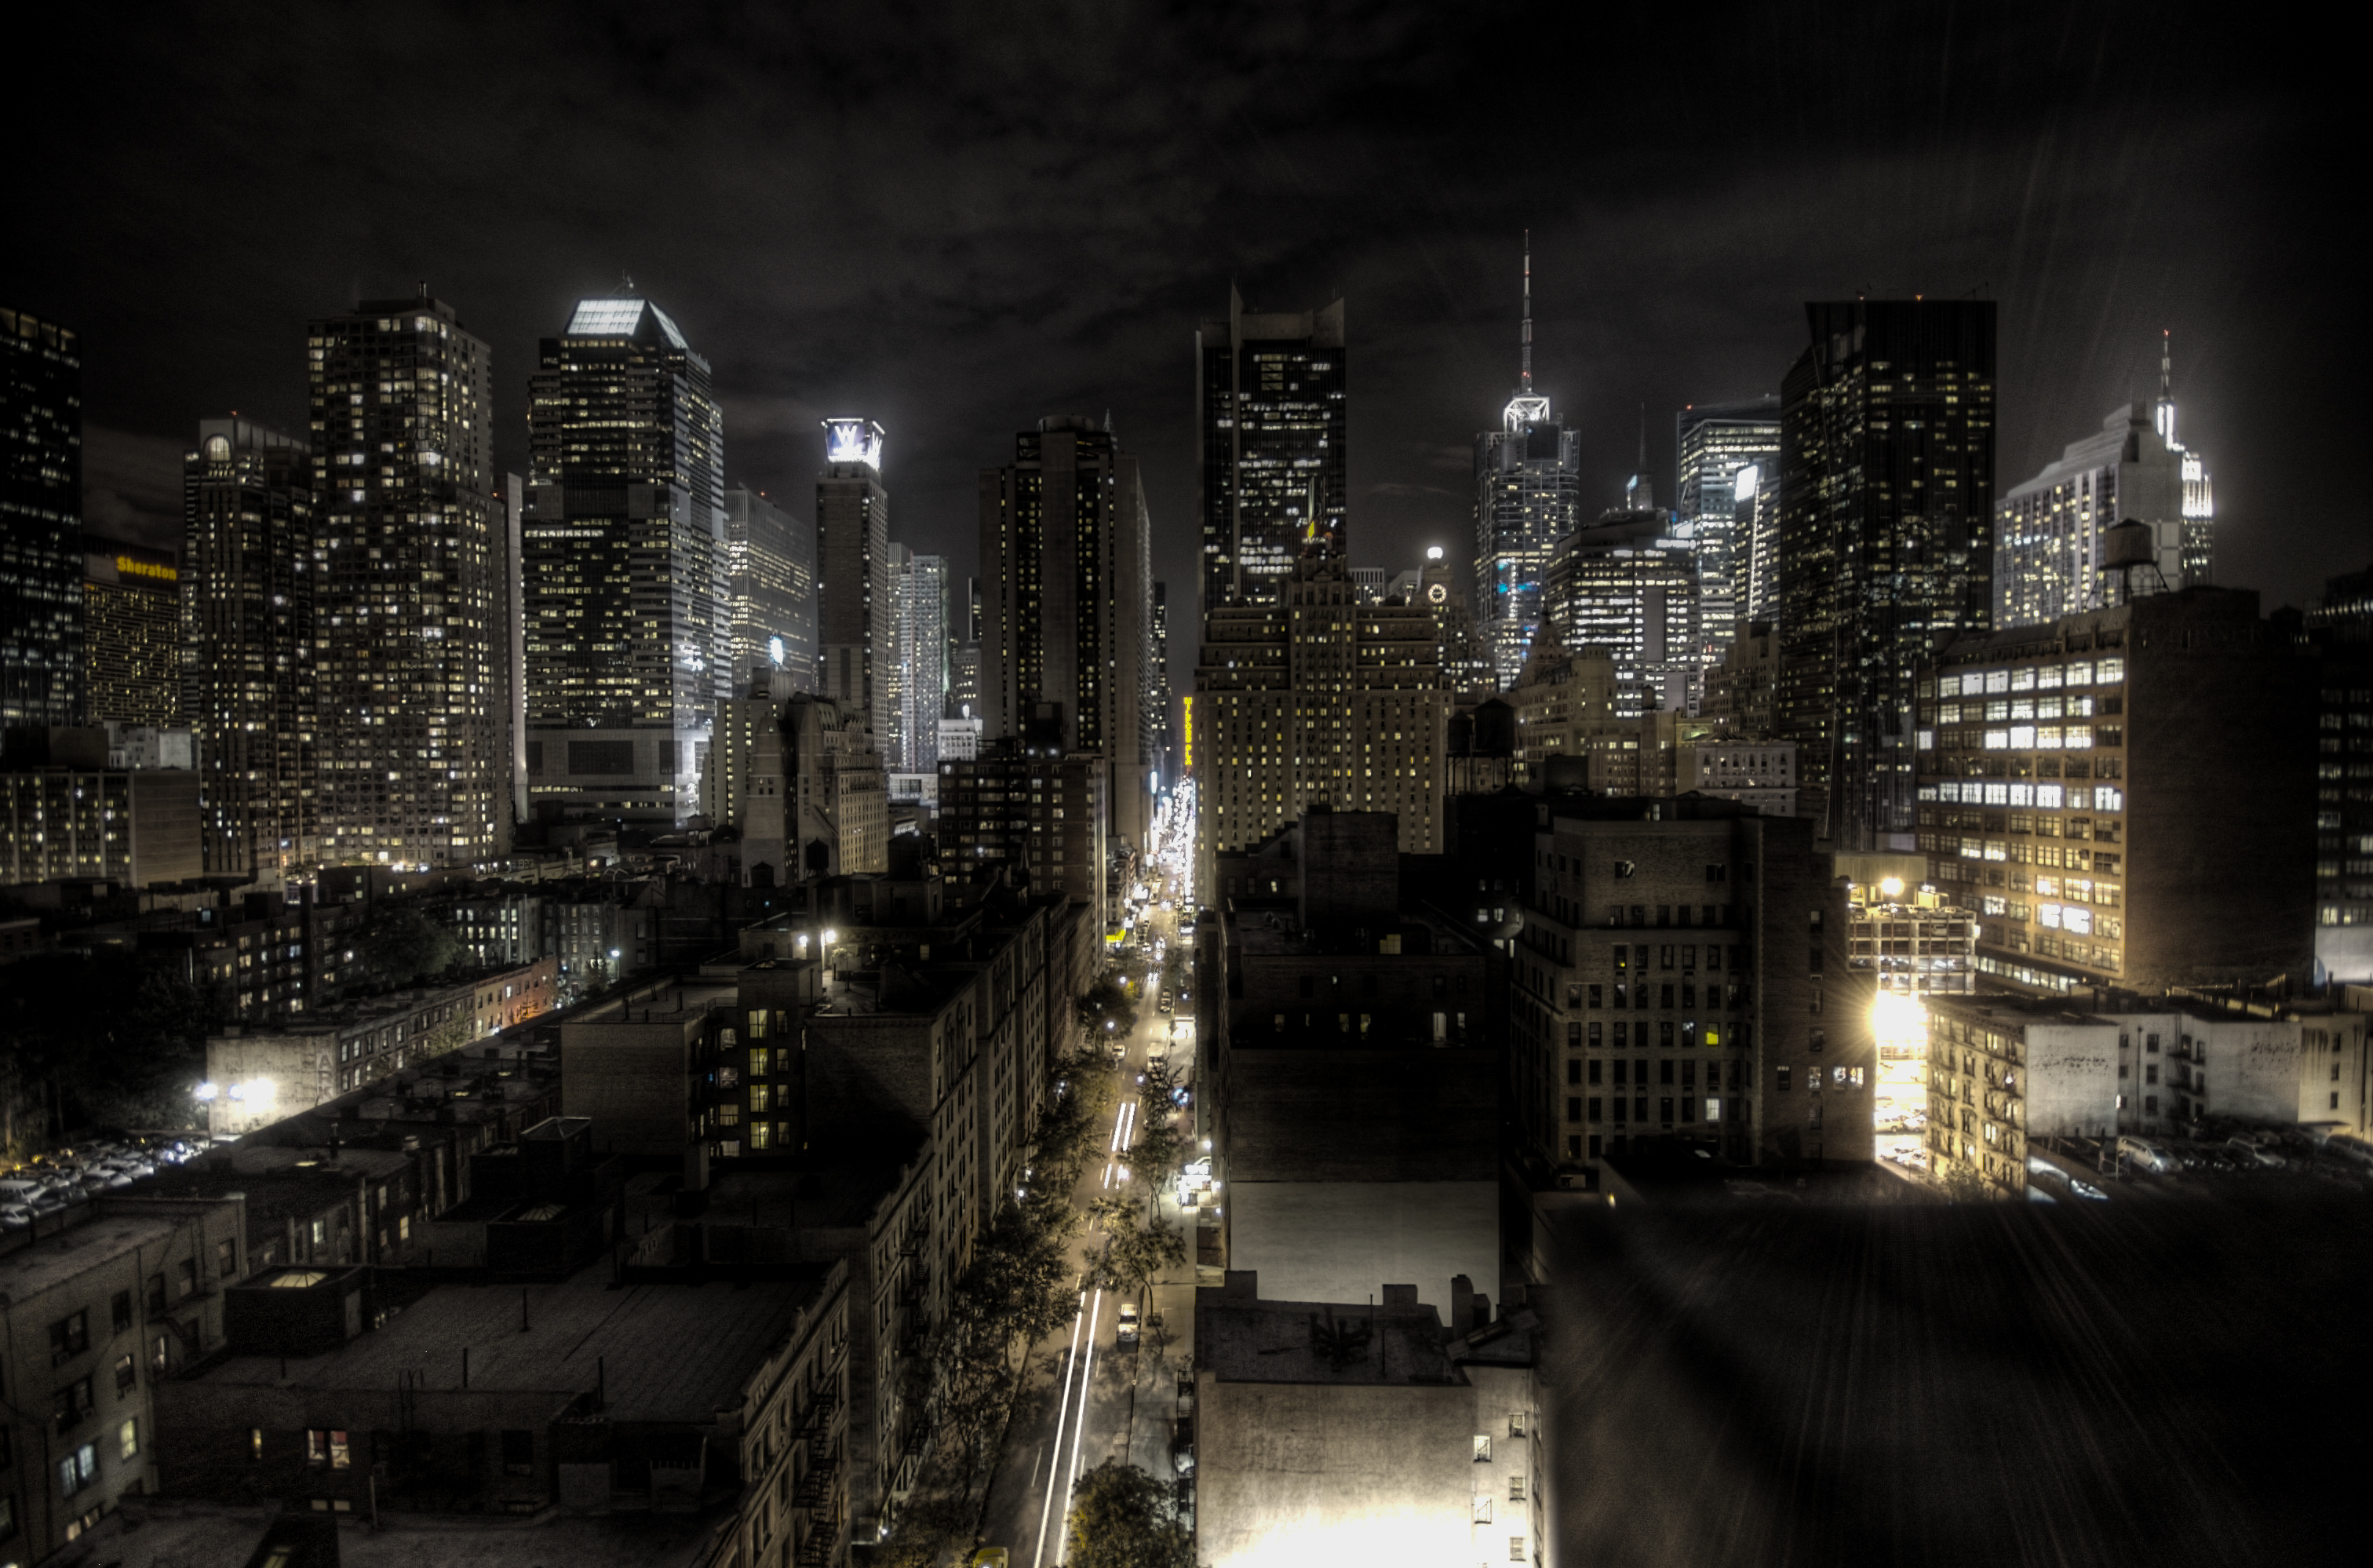 Description New York City at night HDRjpg 3024x1998